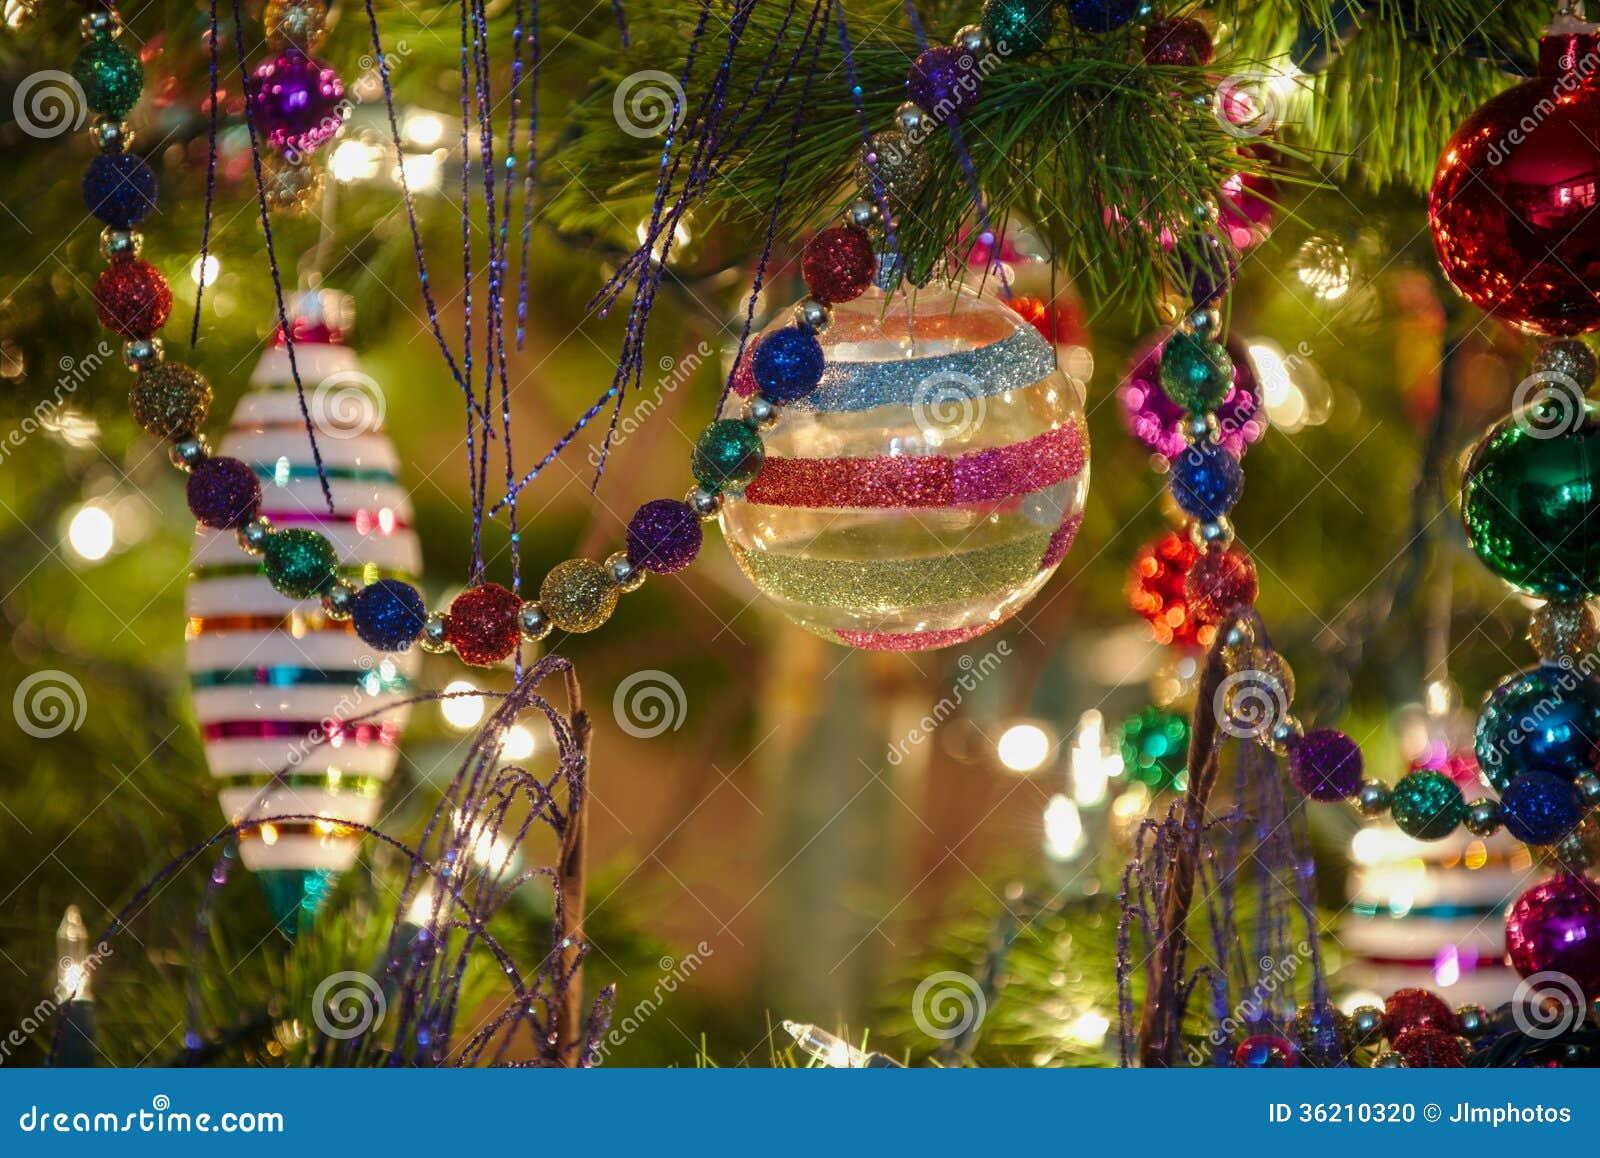 Beautiful Glass Christmas Ornaments Stock Photo Image